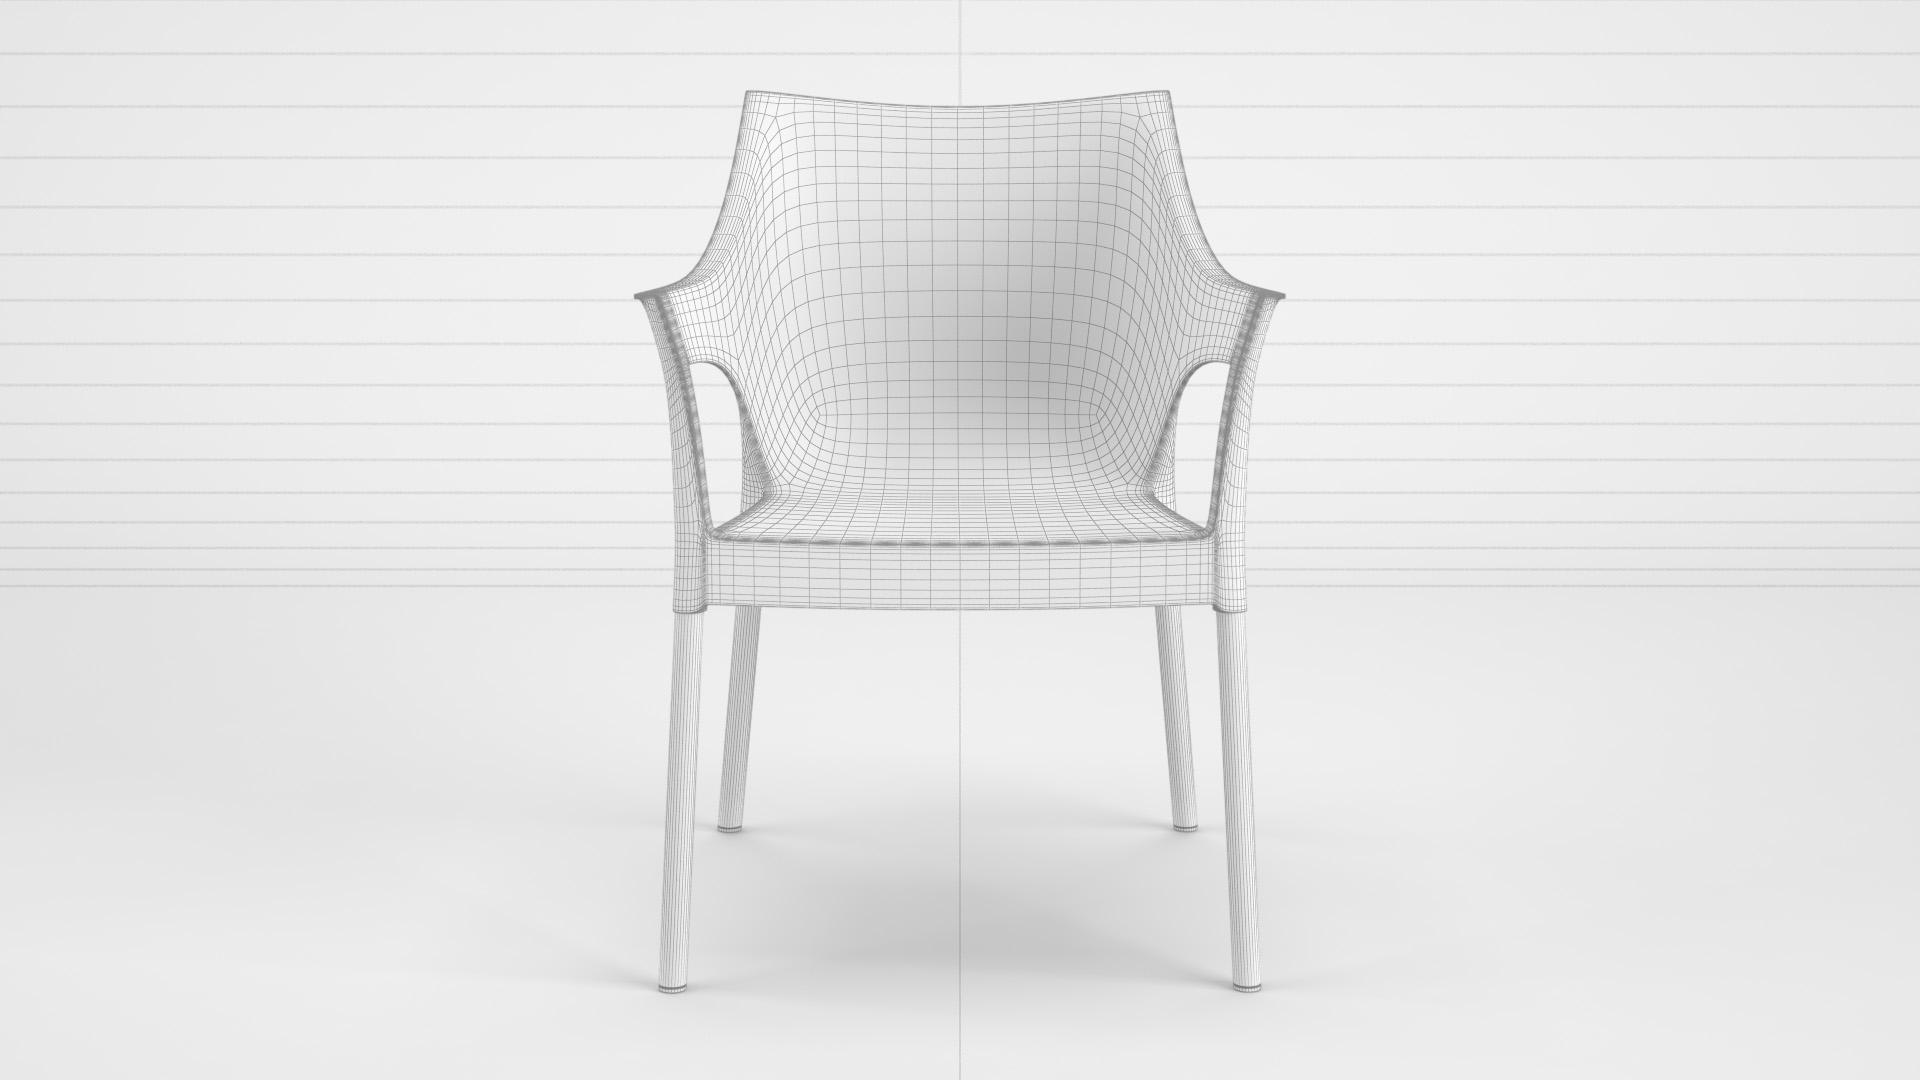 Pole_Chair_WhiteSet_01_wire_0001